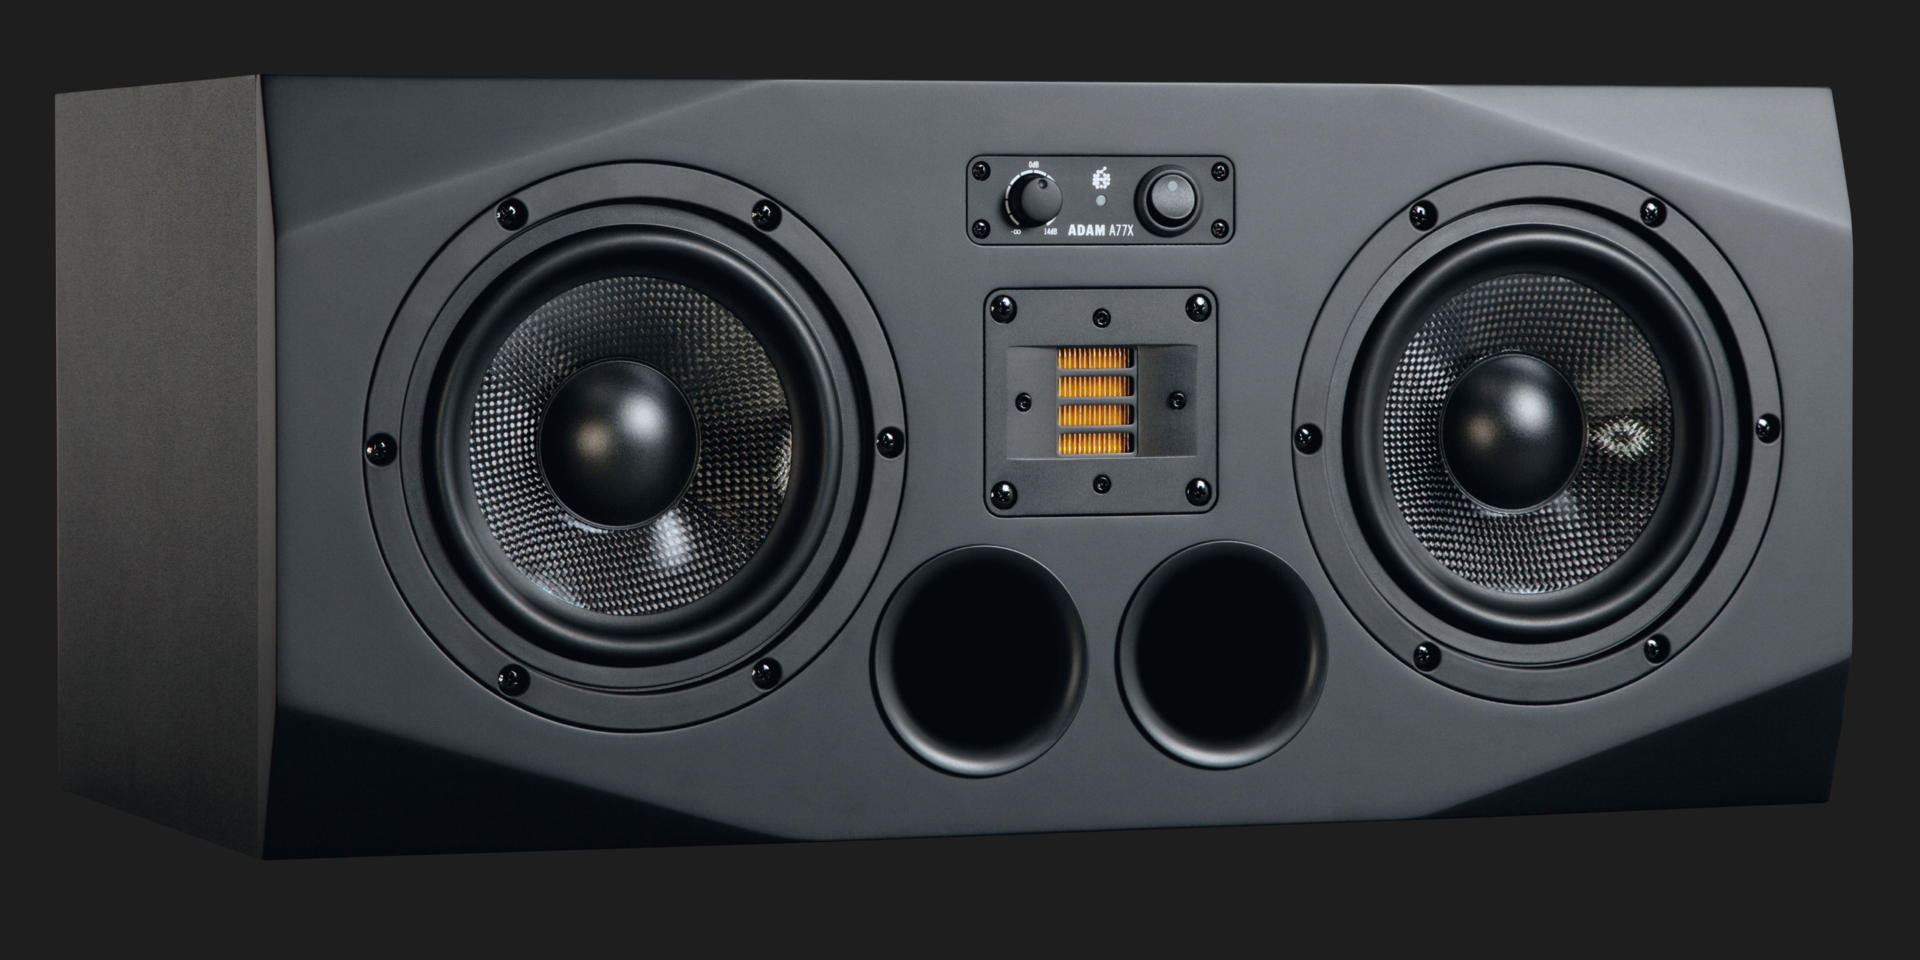 ADAM Audio - A77X Active Studio Monitor (Near-/Midfield)